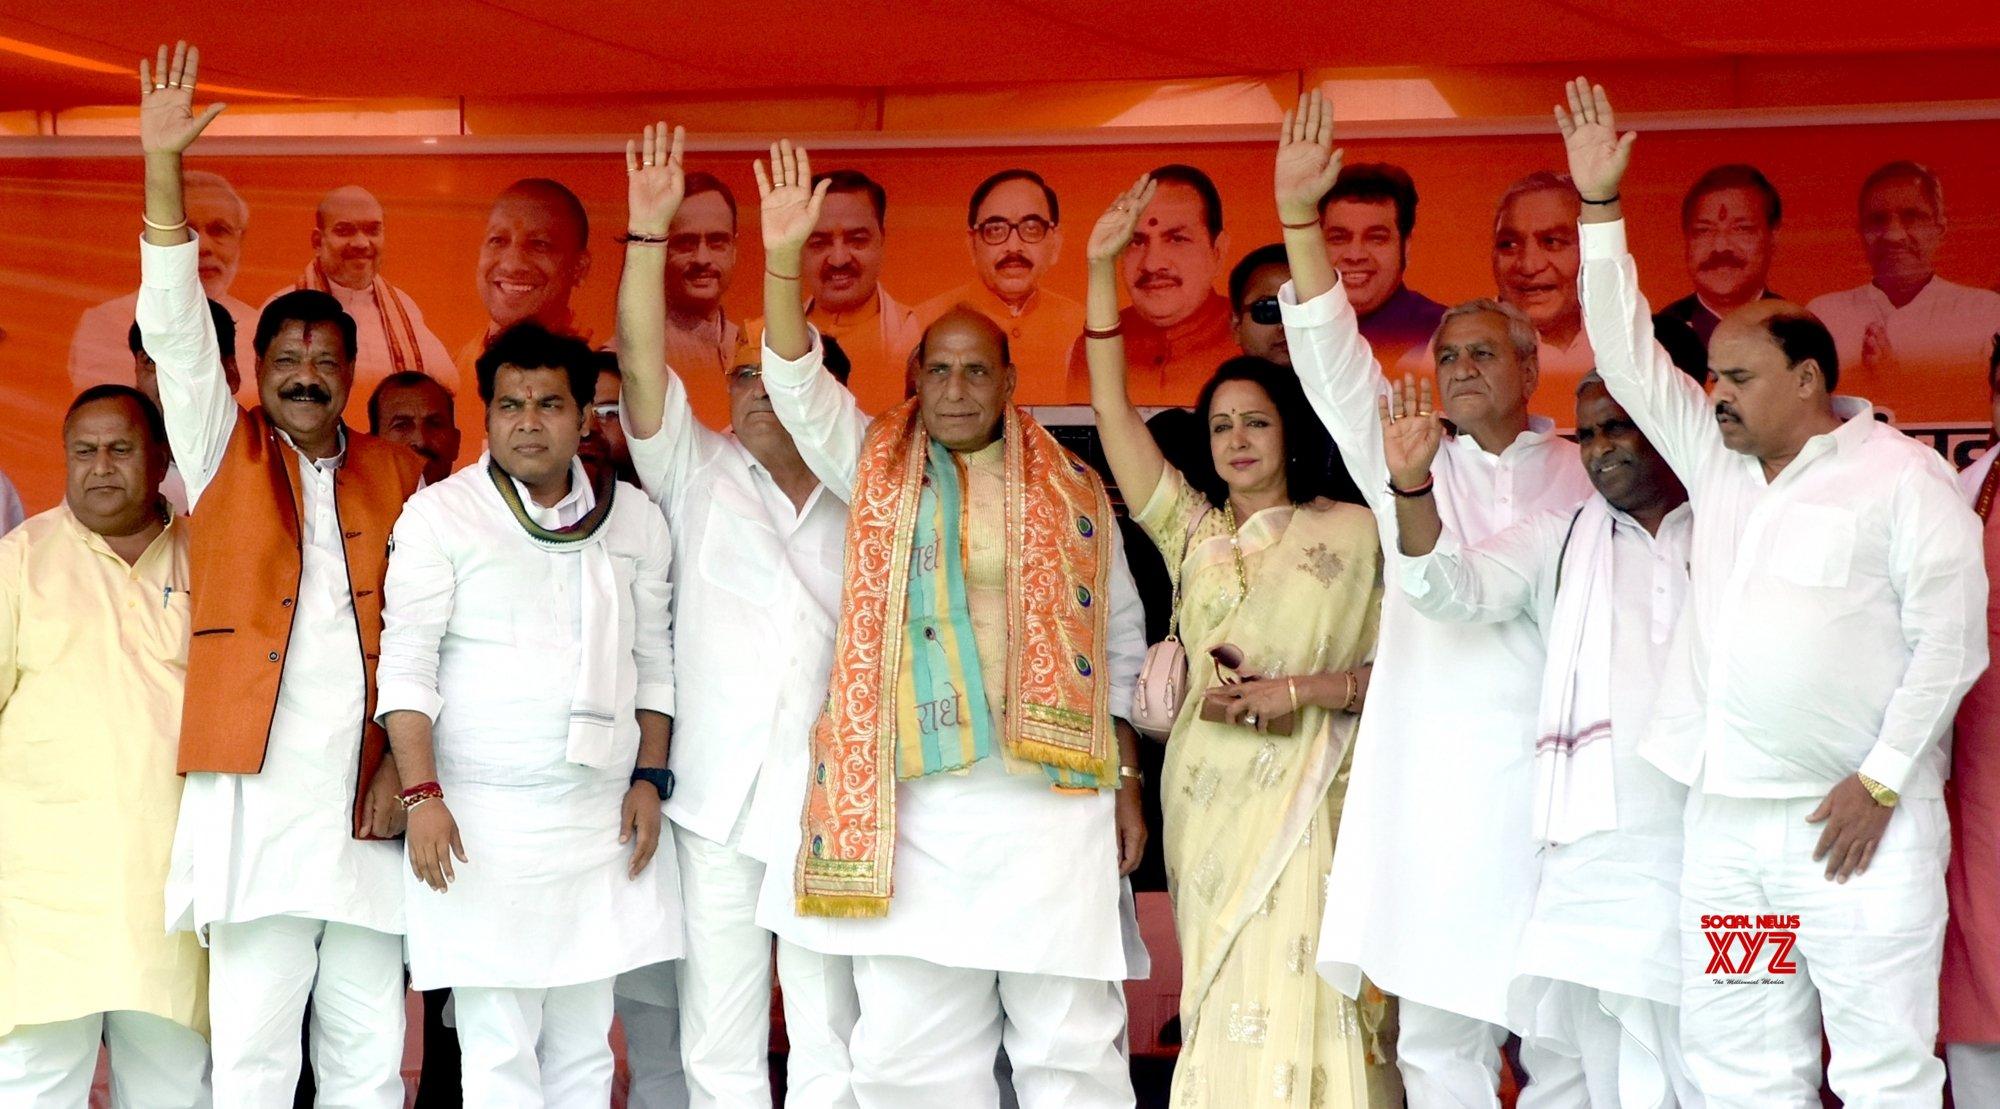 Mathura: 2019 Lok Sabha polls - Rajnath Singh, Hema Malini at an election rally #Gallery